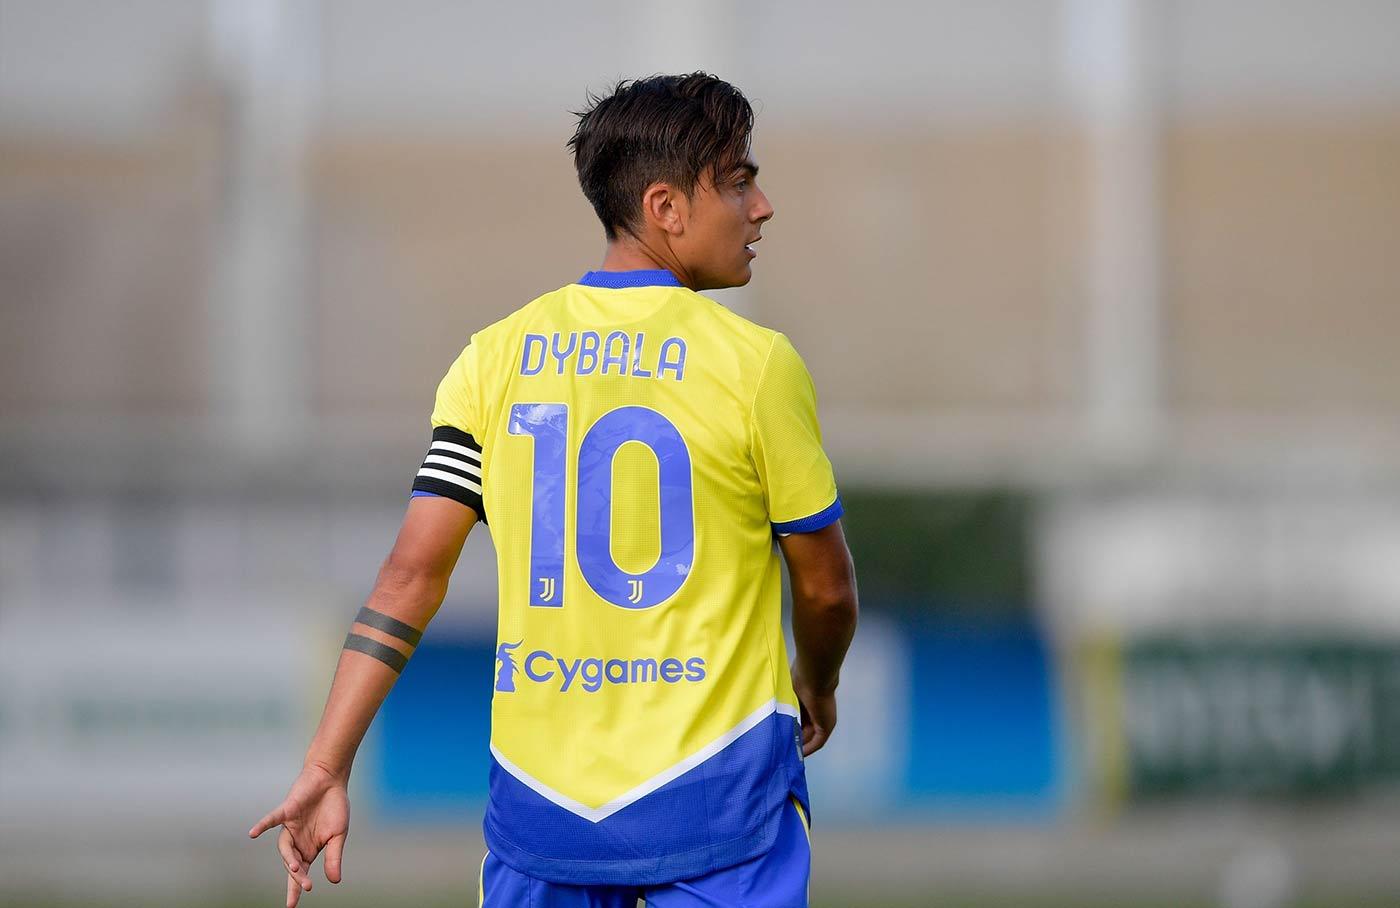 Font Dybala Juventus